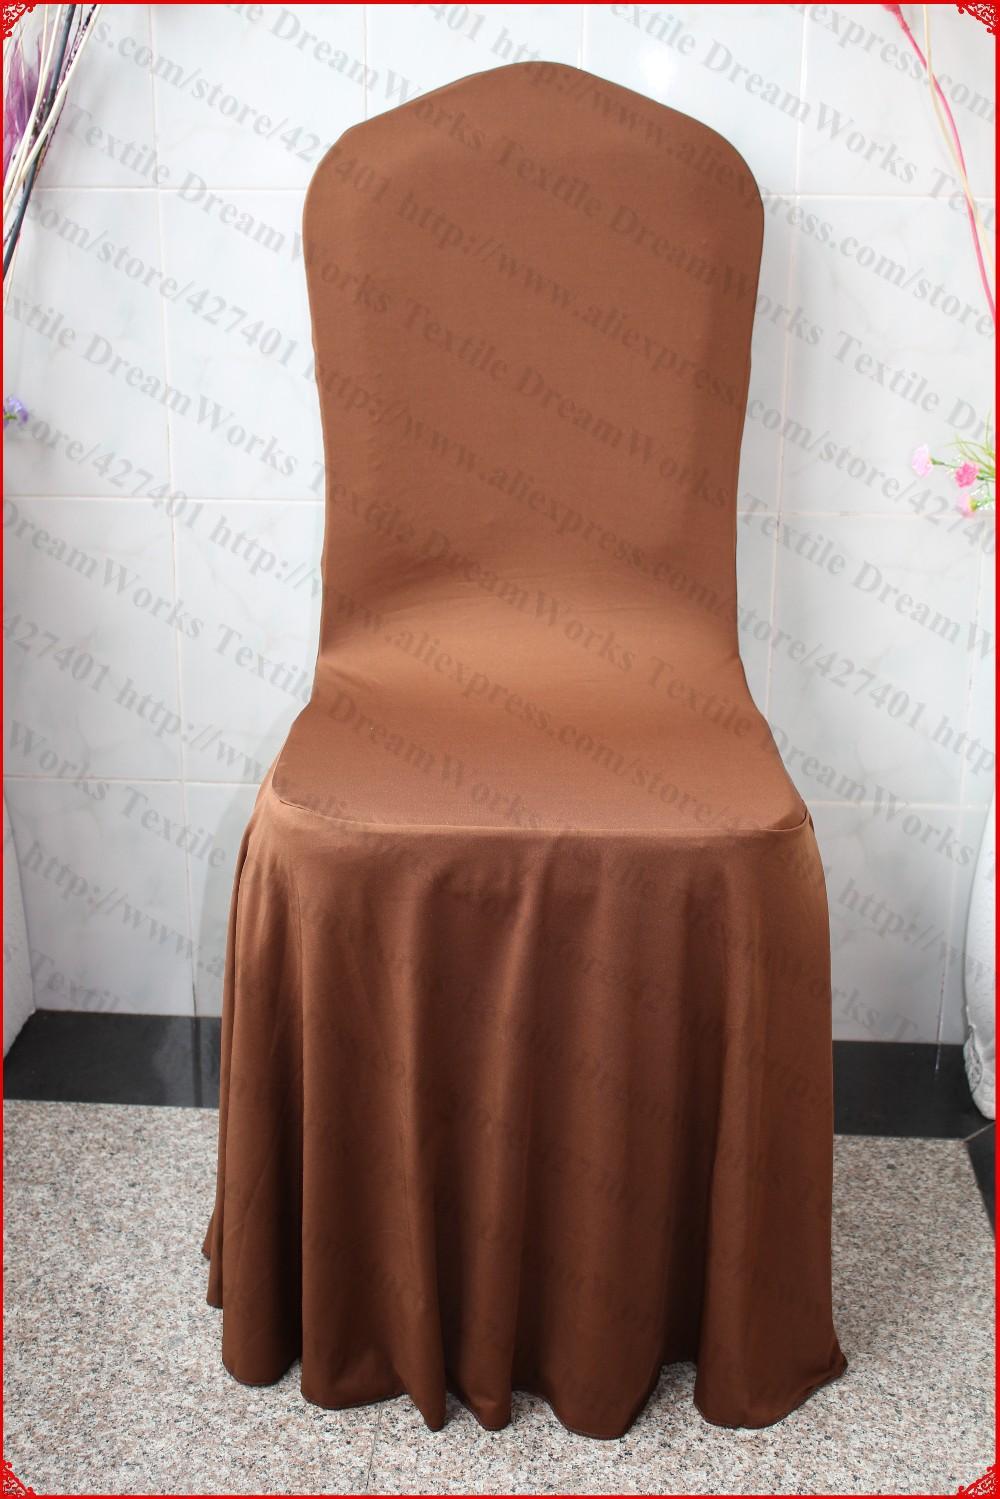 Cahaya Perak Elegan Lipit Swag Spandex Kursi Penutup Lycra Comport Carpet Karpet Mercy B200 Premium 2cm Img 0475 3036 3040 3048 3052 3058 3064 3069 3073